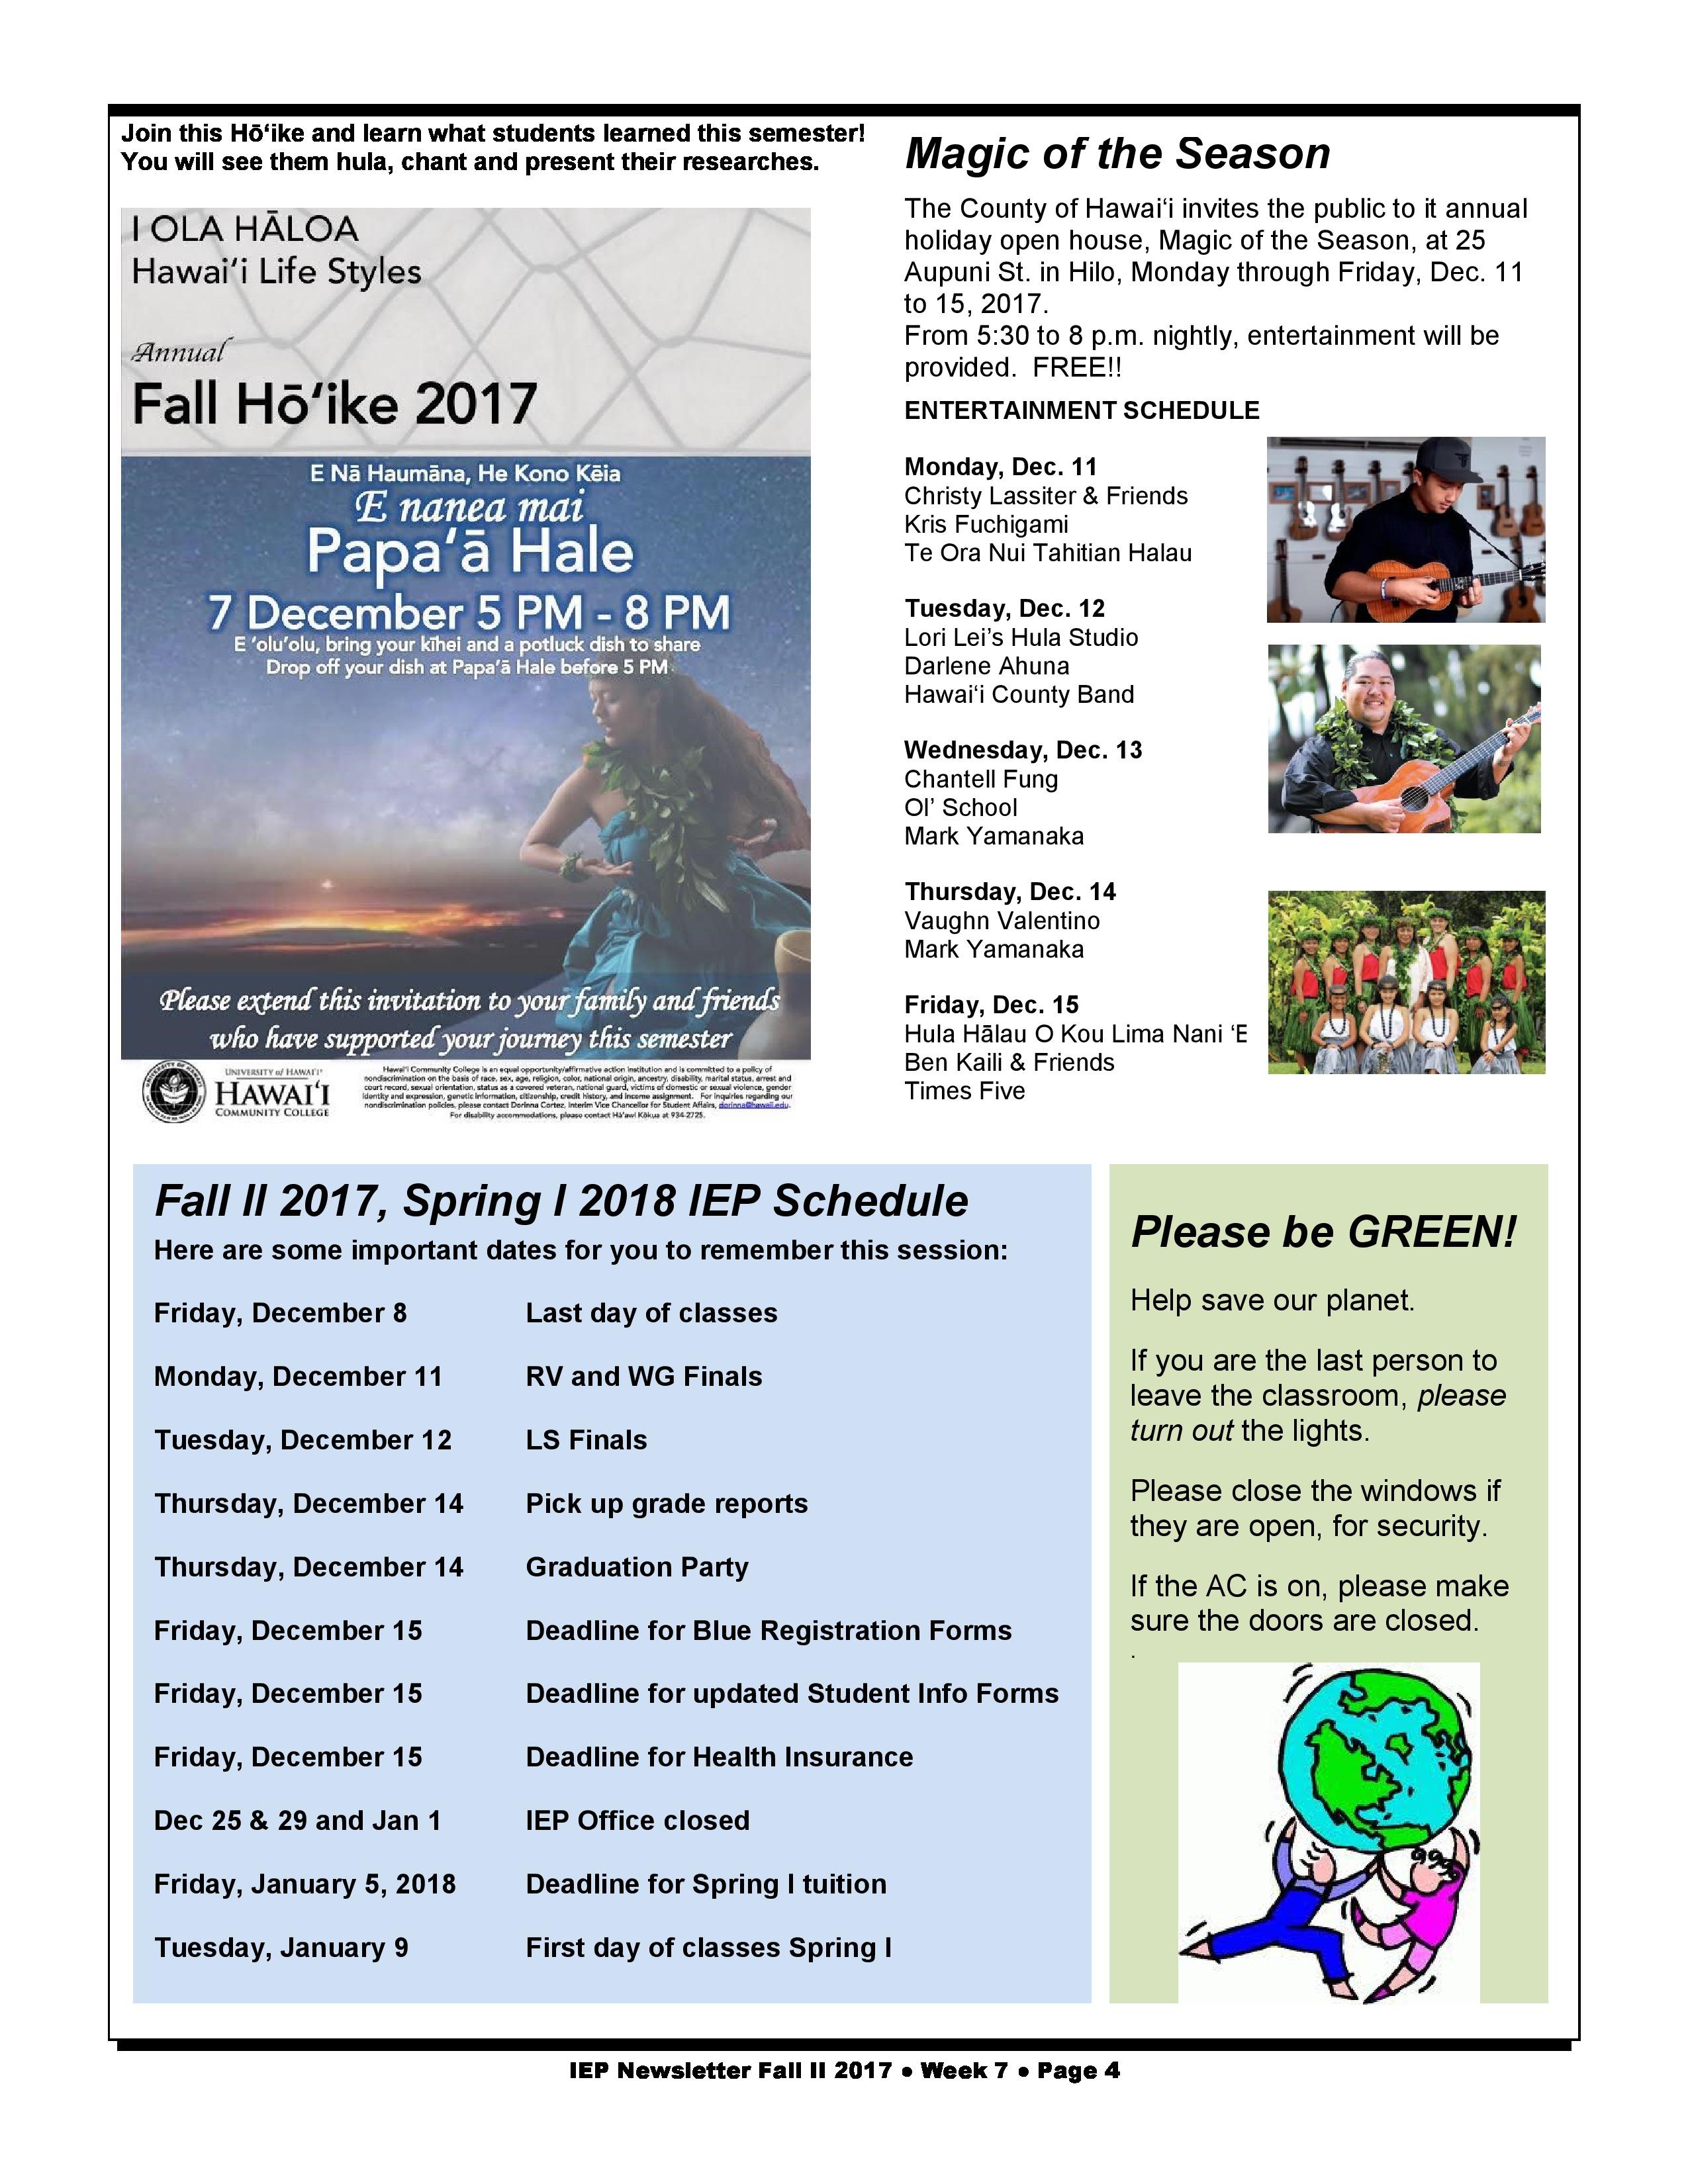 IEP Newsletter Week 7 Fall II 2017 - Intensive English Program - Hawaiʻi Community College